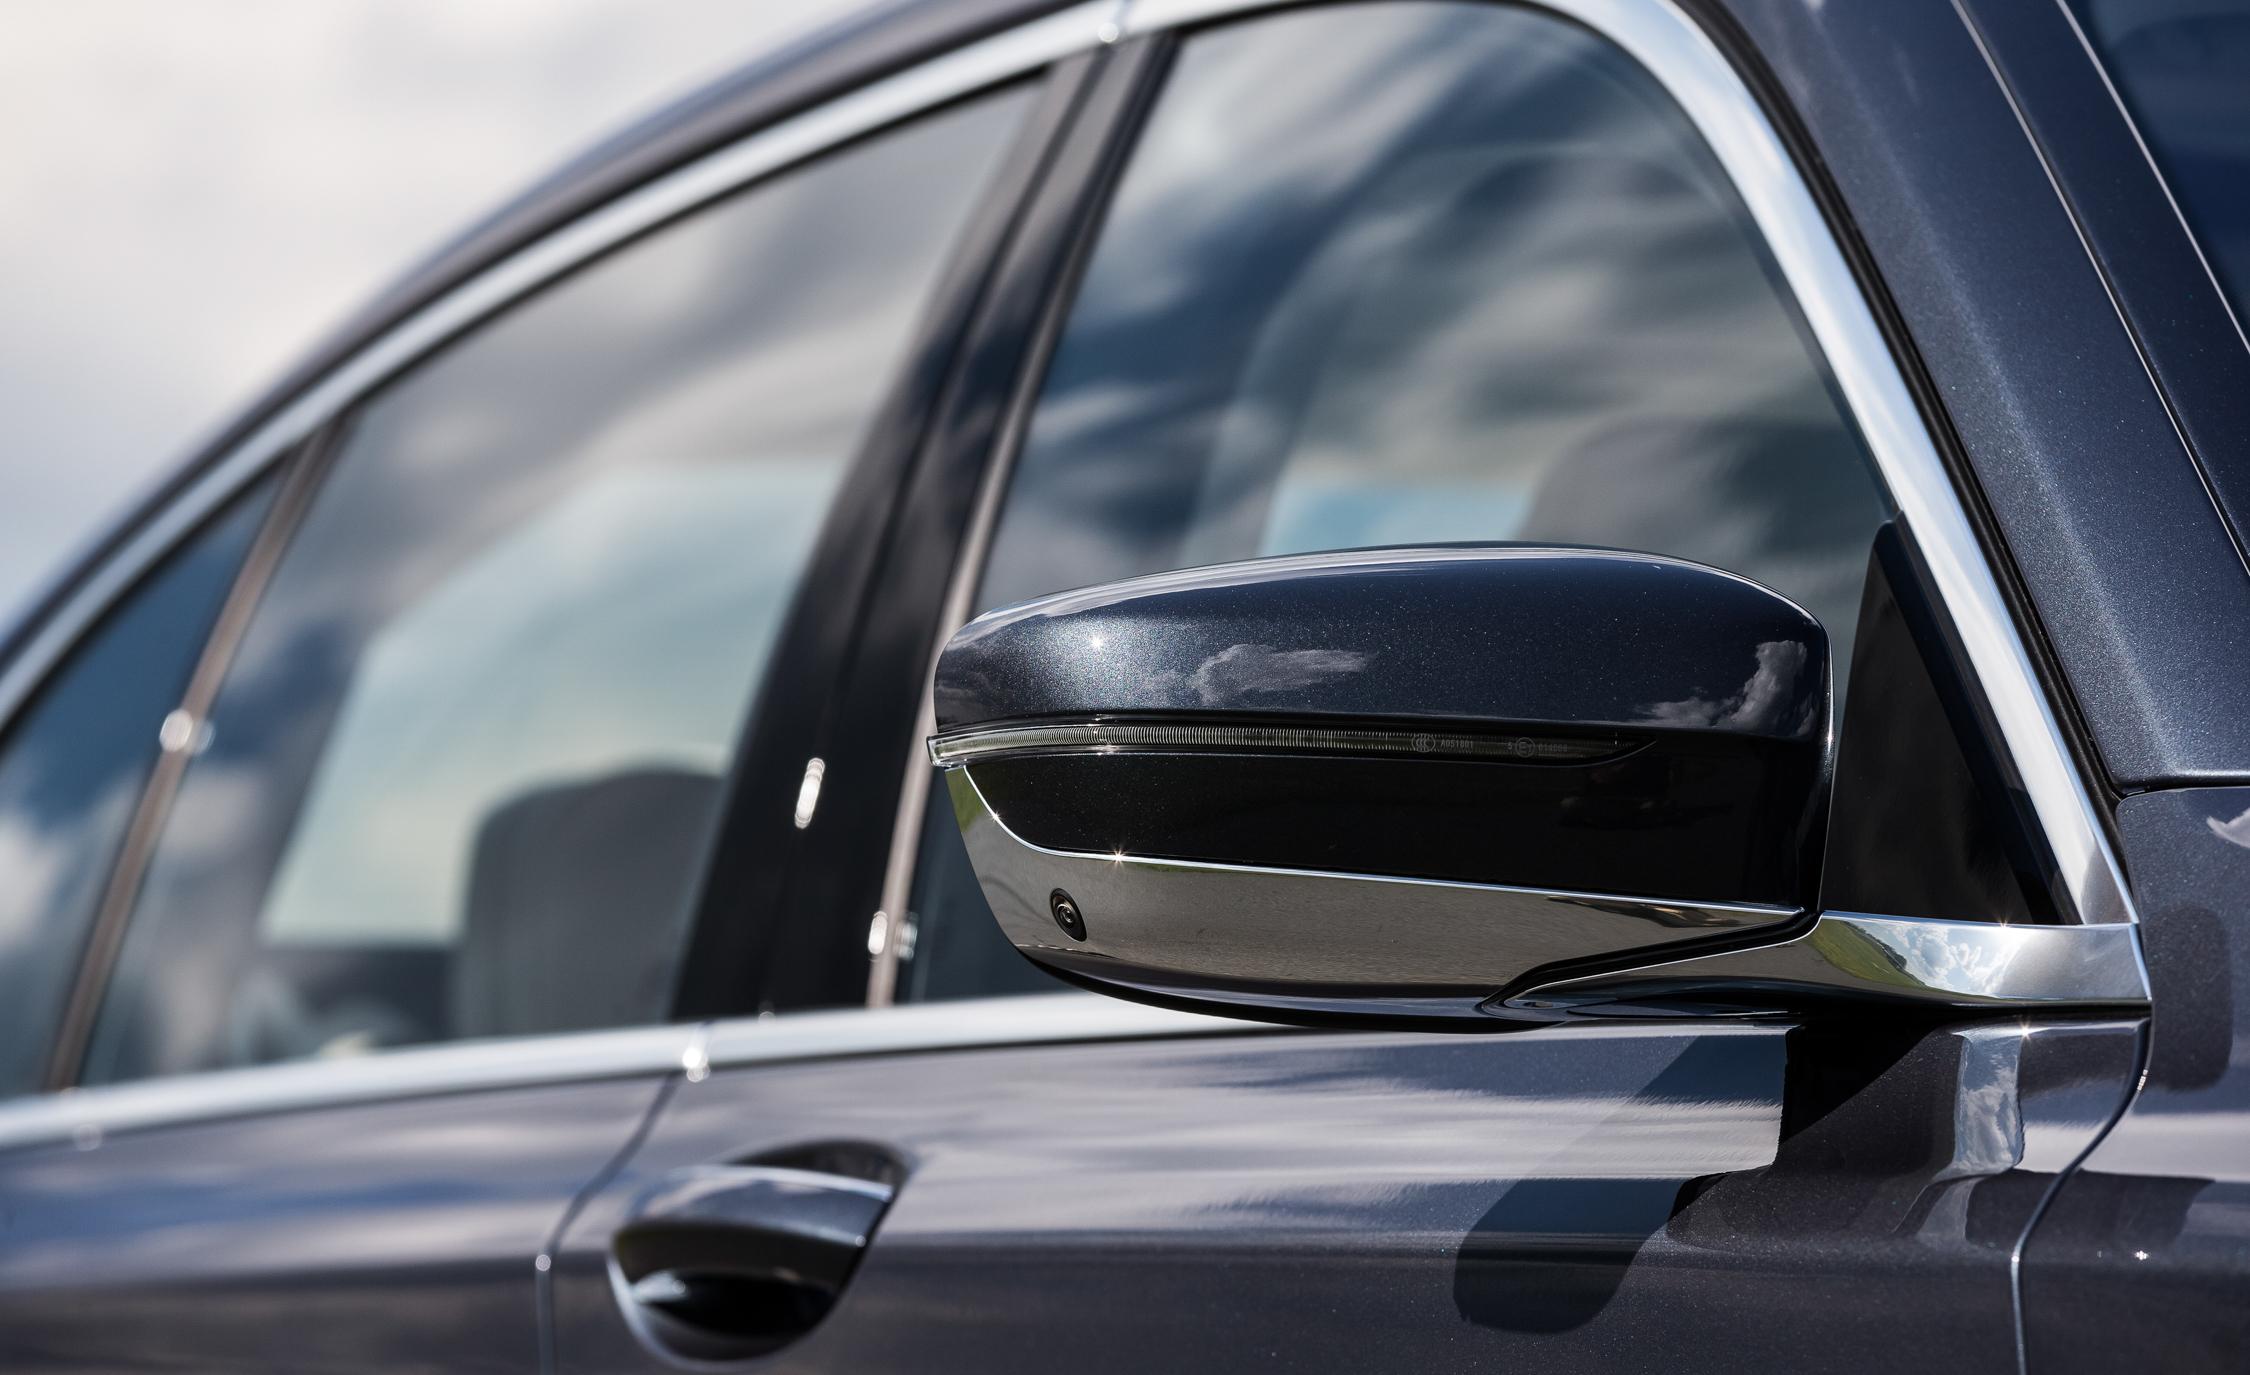 2016 BMW 750i xDrive Exterior Mirror